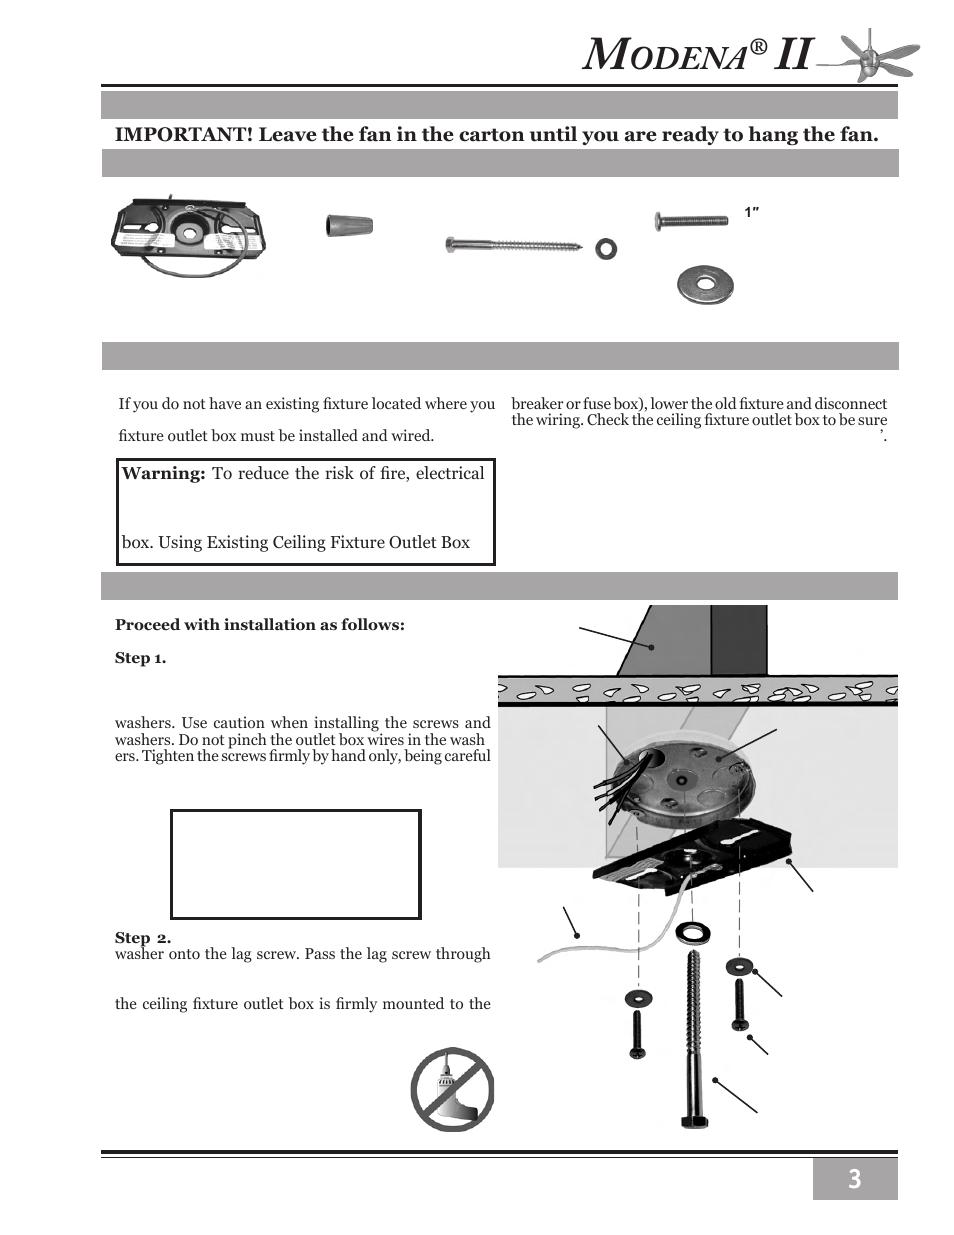 Odena Installation Instructions Ceiling Hardware Getting Started Wiring Fan Crossbar Mounting Bracket Casablanca